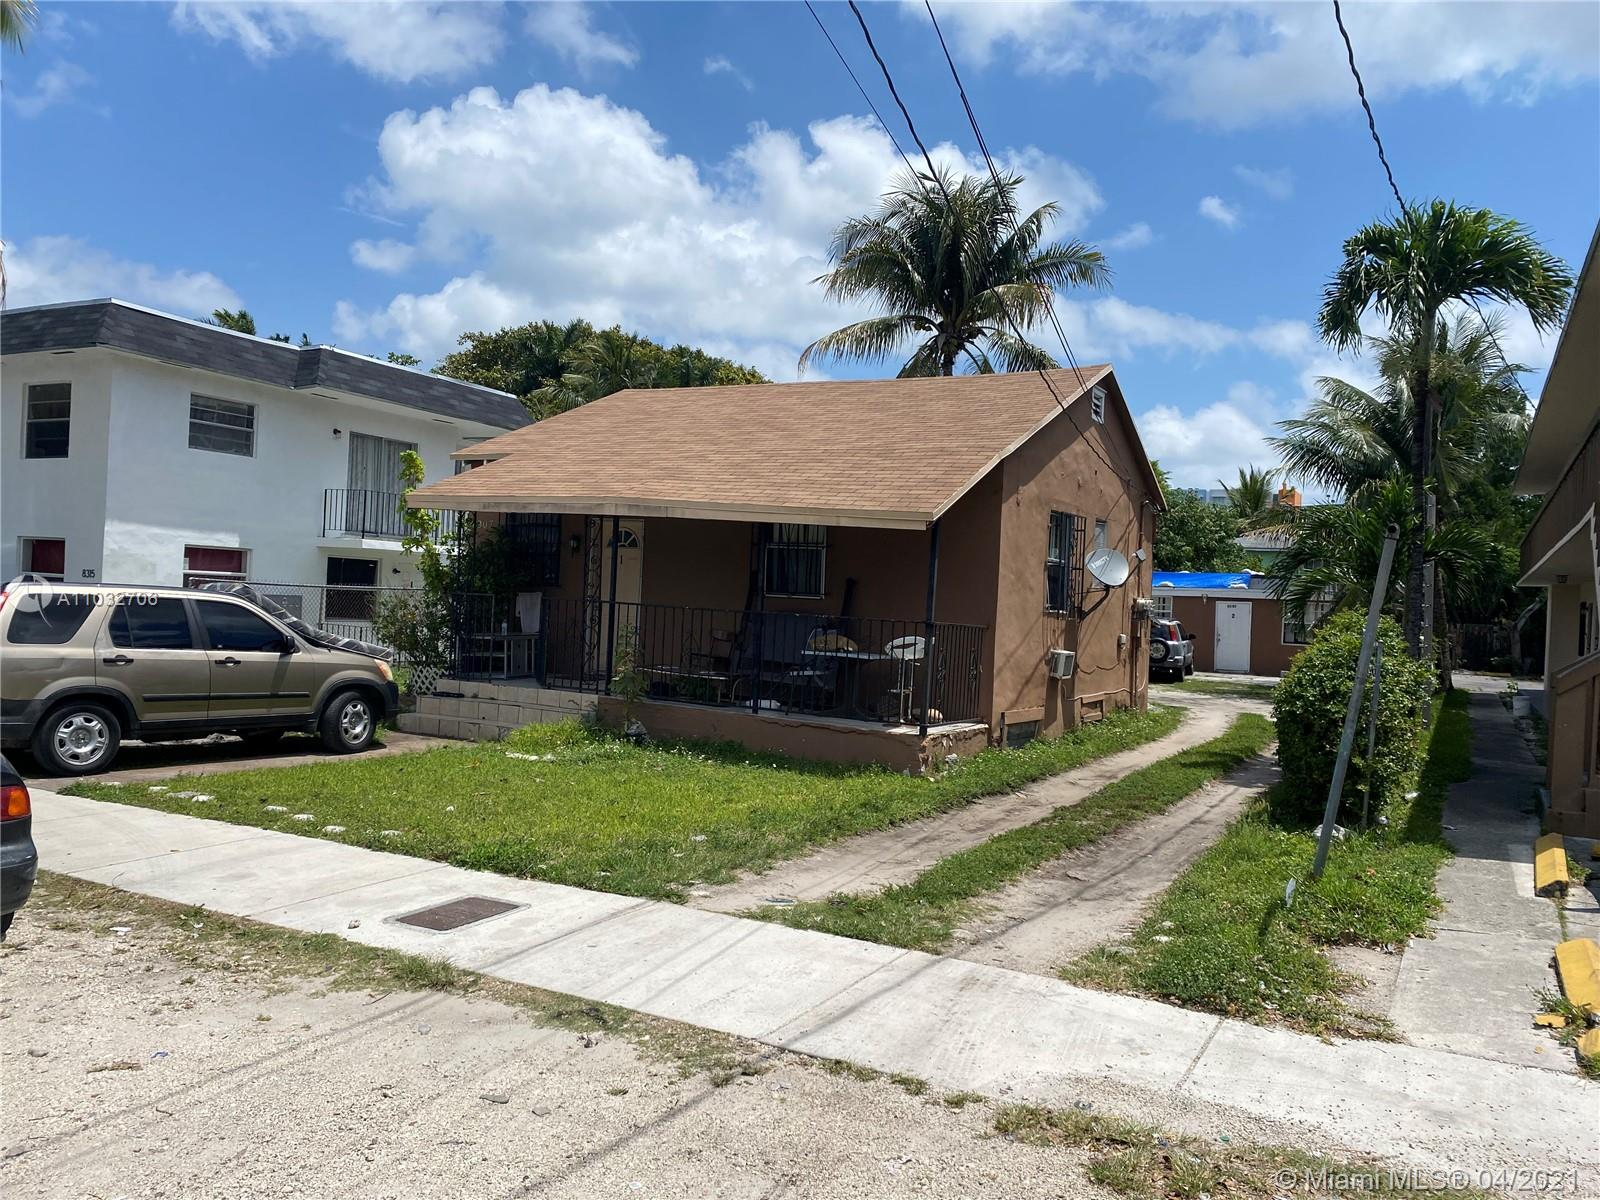 /  1832 sq. ft. $ 2021-04-25 0 Photo